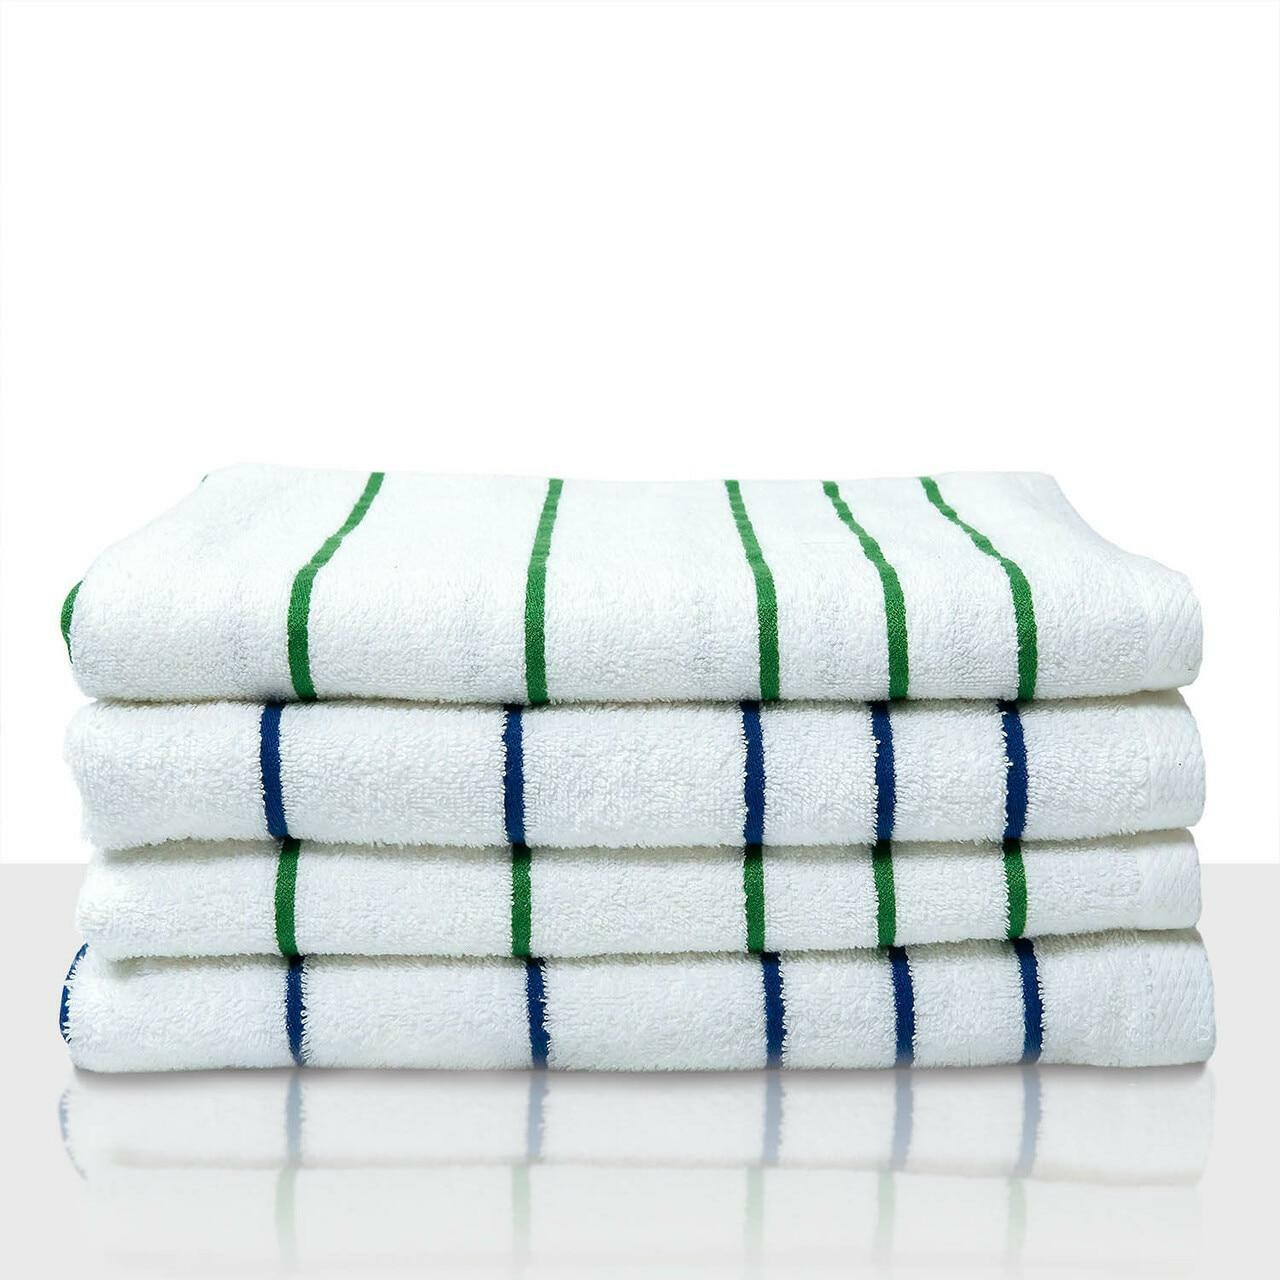 WestPoint/Martex Martex Resort Pool Towel Collection